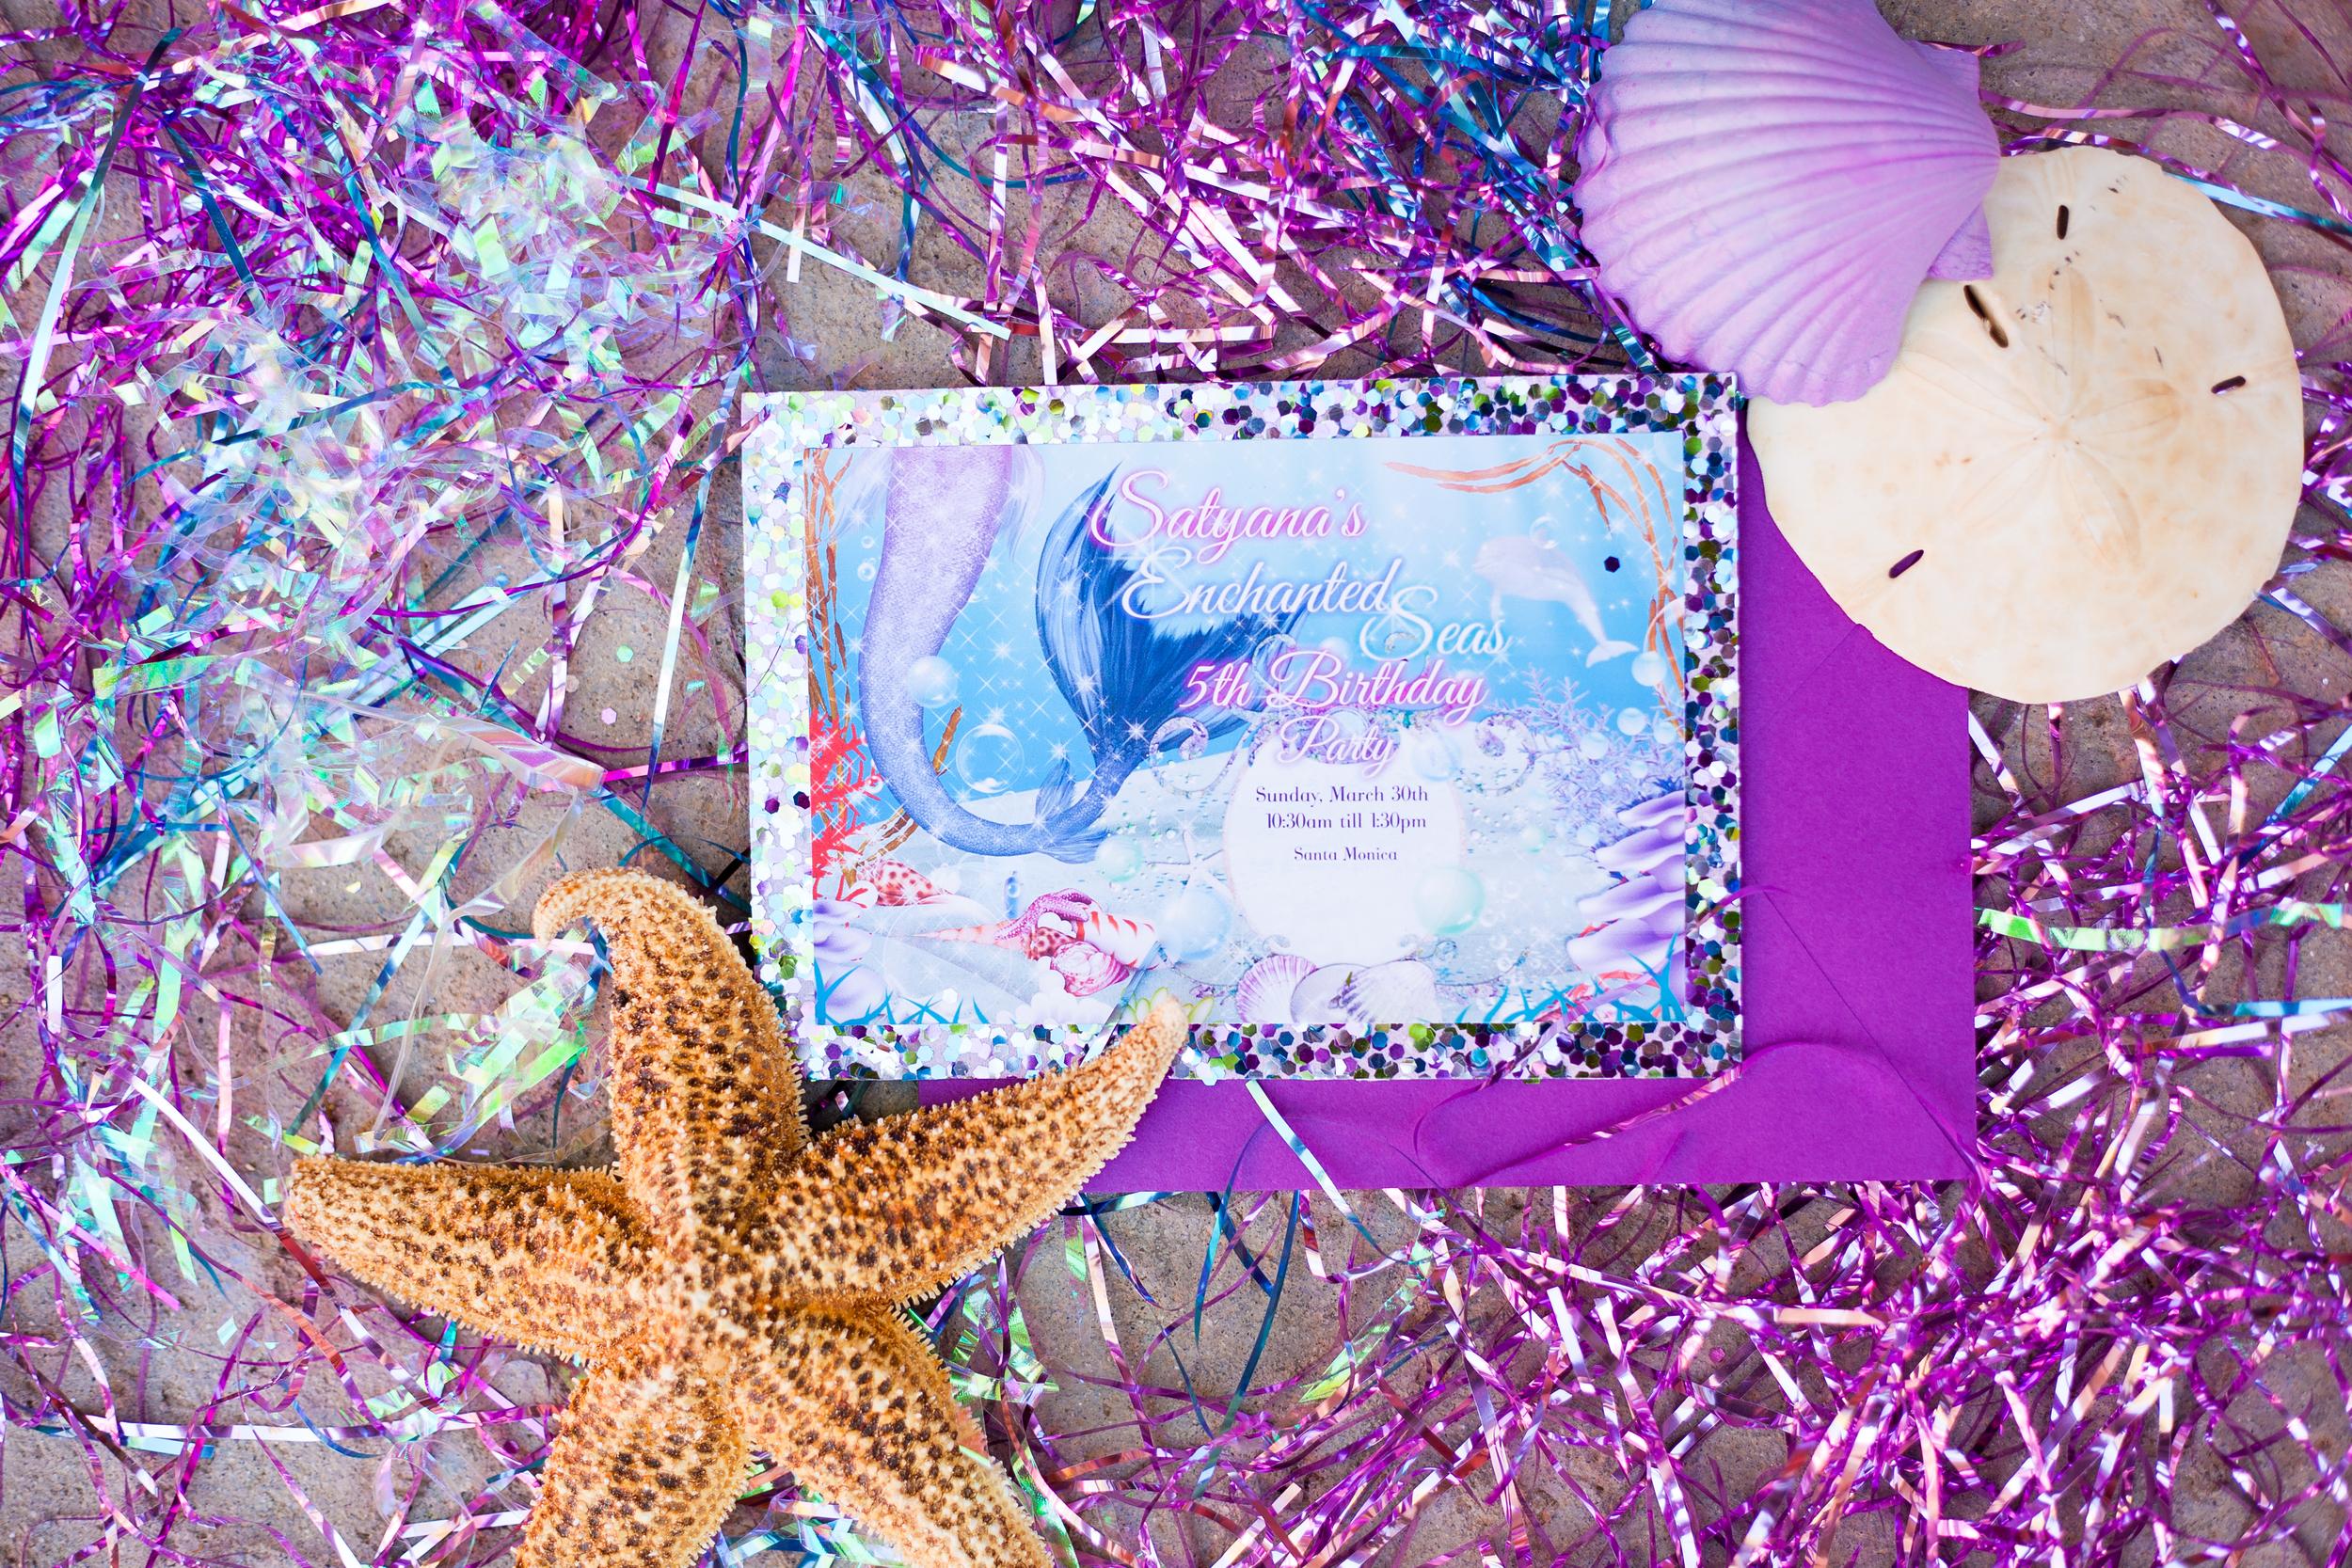 001 CORRECT magical mermaid grotto.jpg